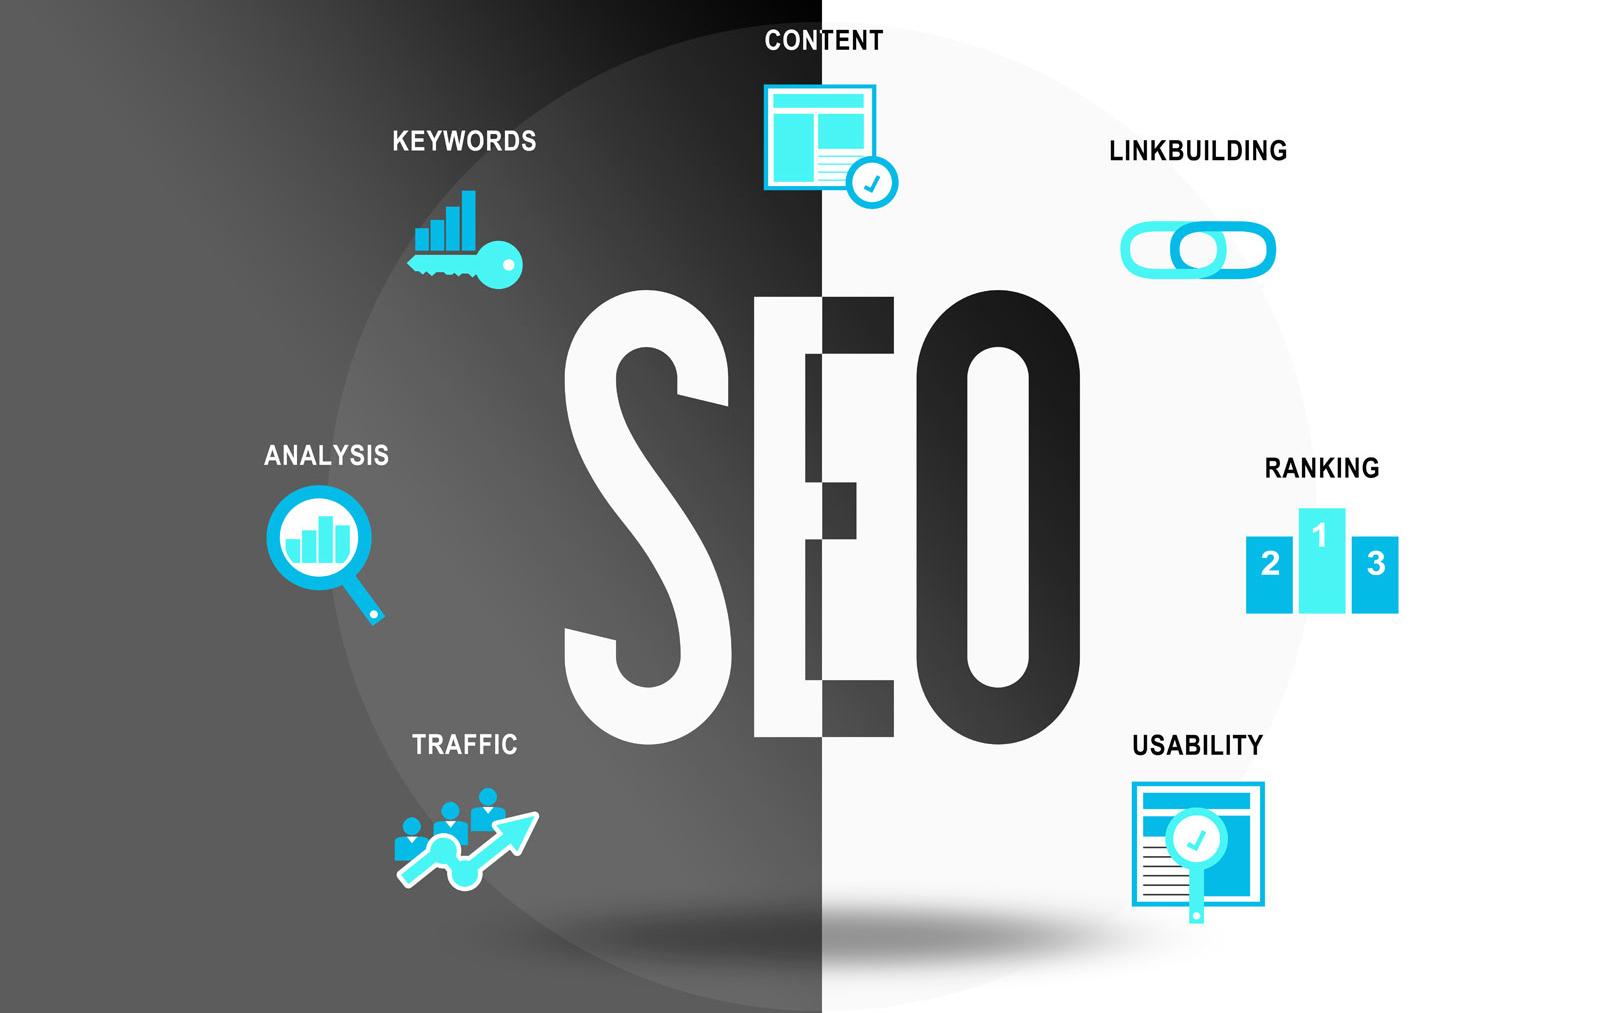 SEO - Content, Linkbuilding, Ranking, Usability, Traffic, Analysis, Keywords